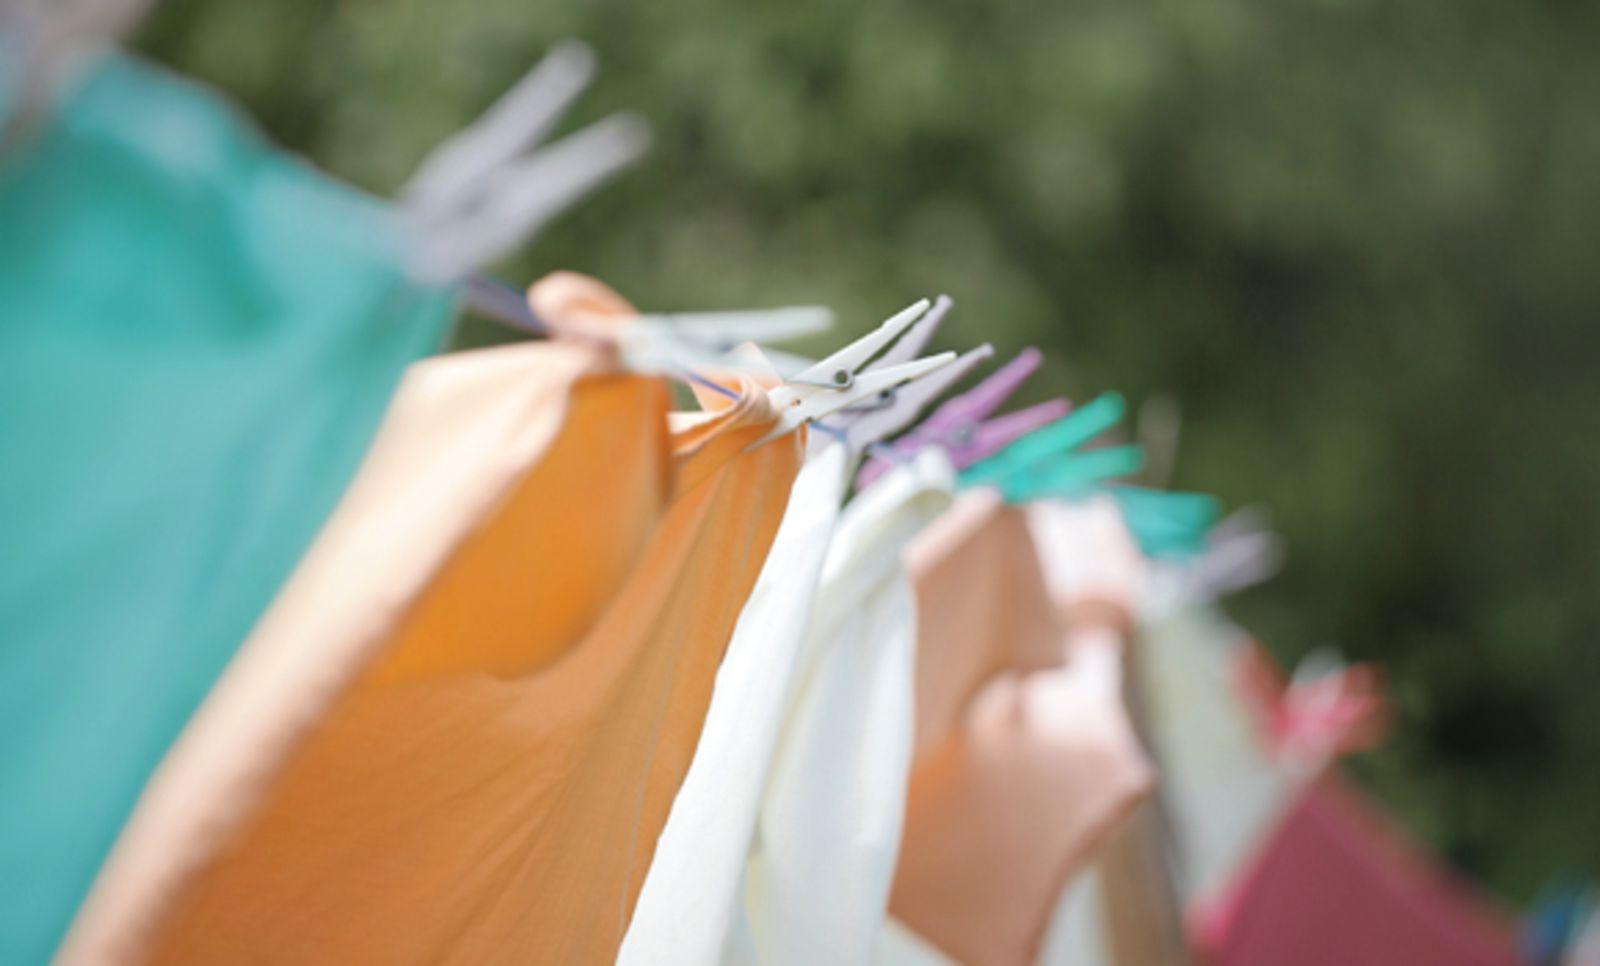 drying the laundry.jpg